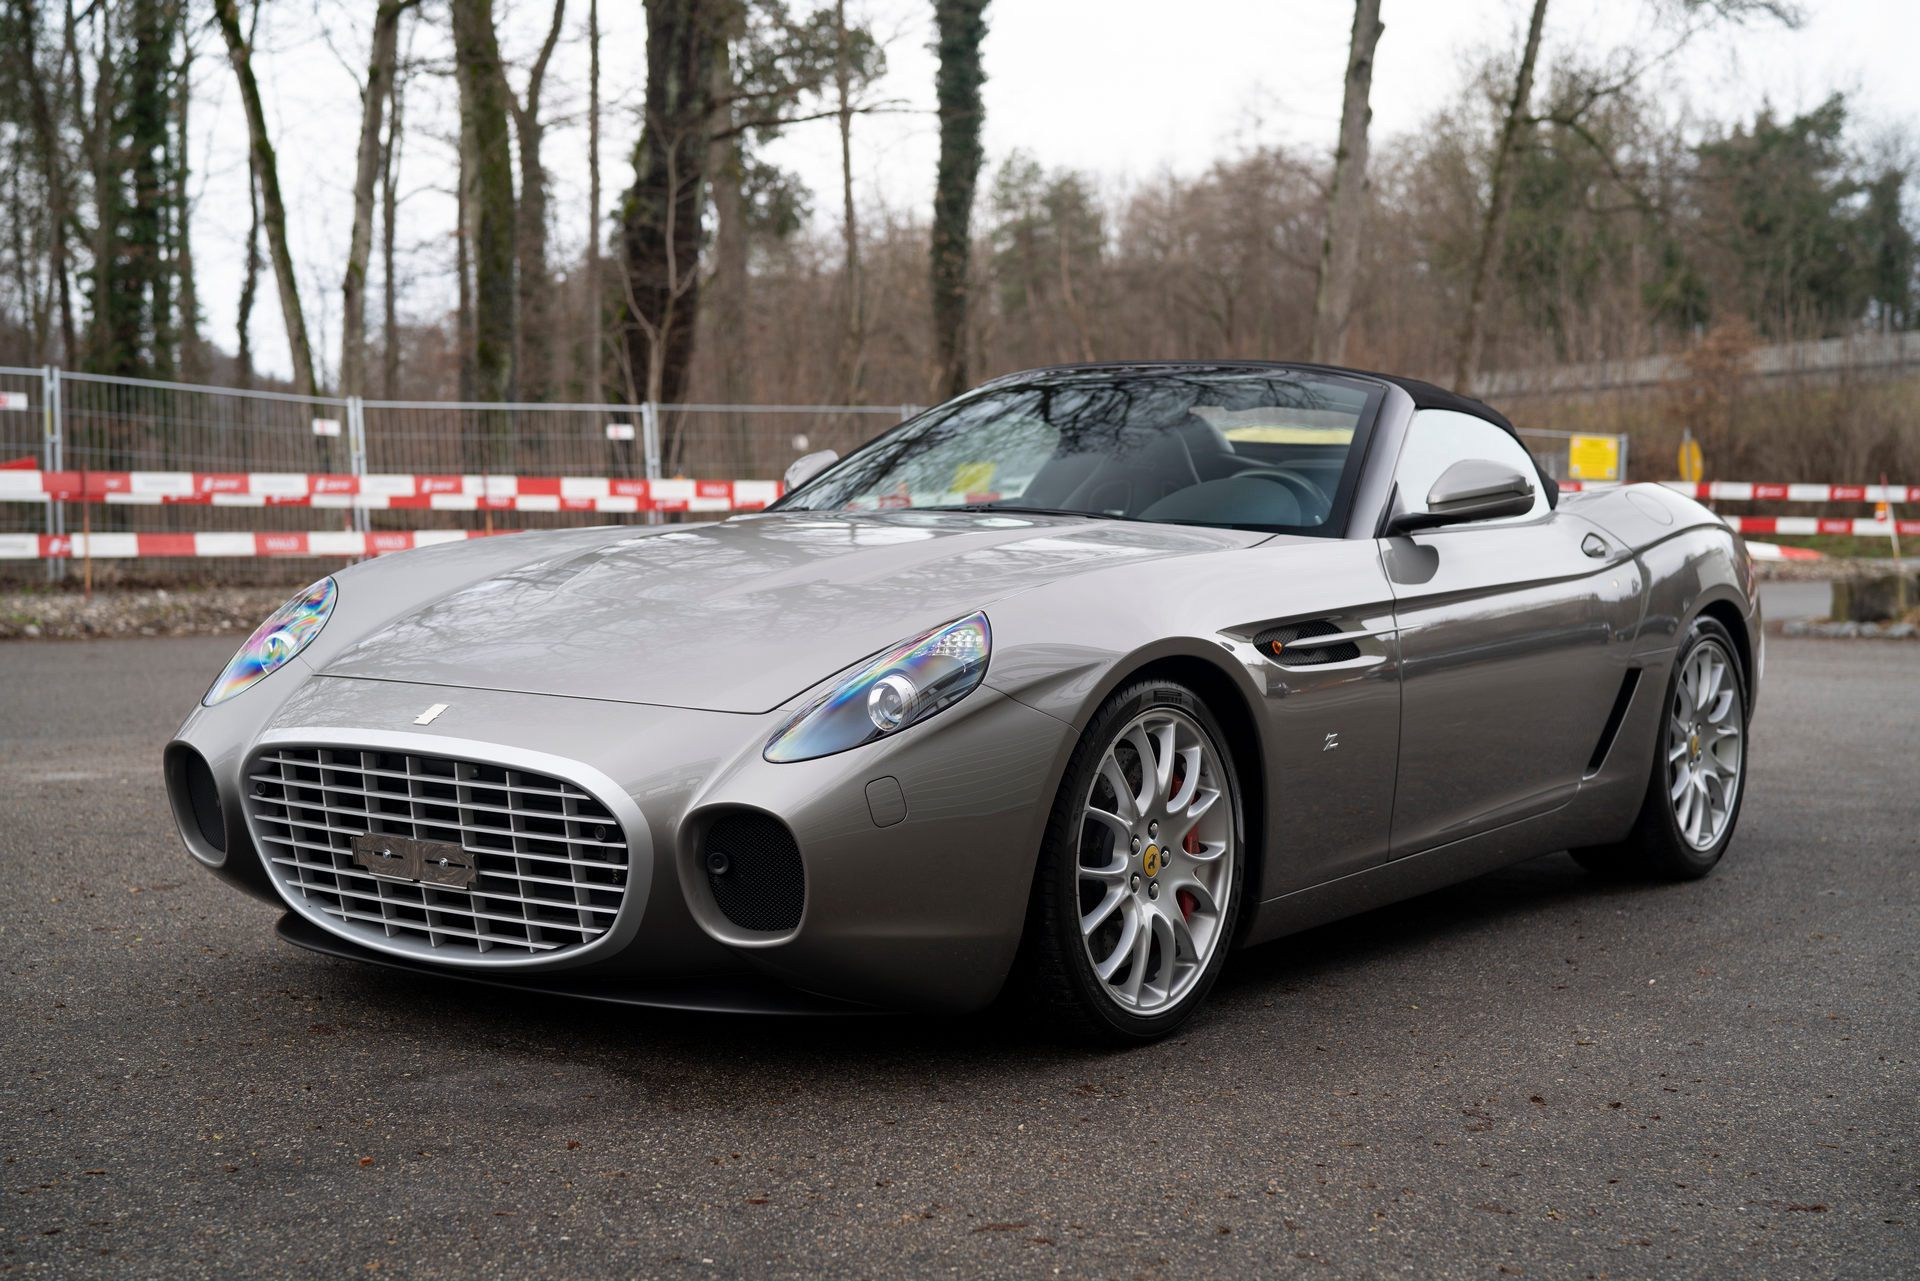 Ferrari_599_GTZ_Nibbio_sale-0000